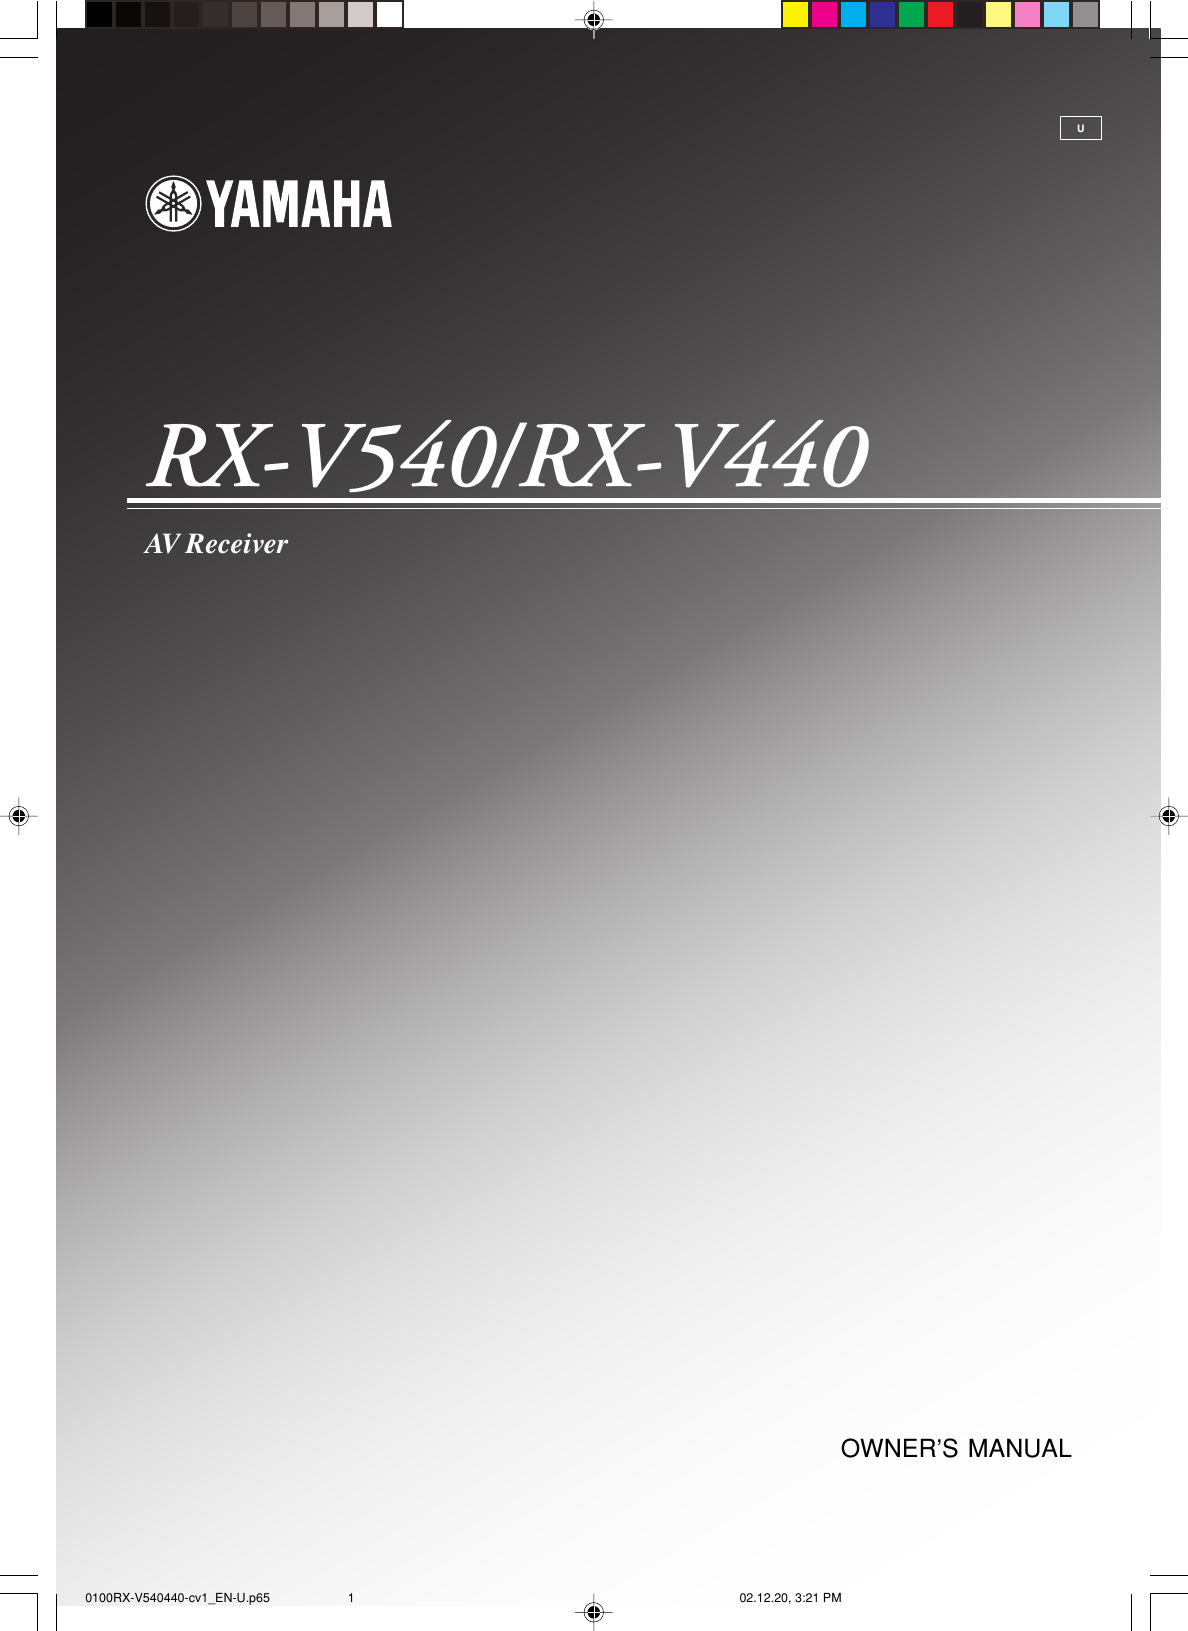 specifications Array - yamaha rx v540 owners manual 0100rx v540440 cv1 en u  p65 rh usermanual wiki ...